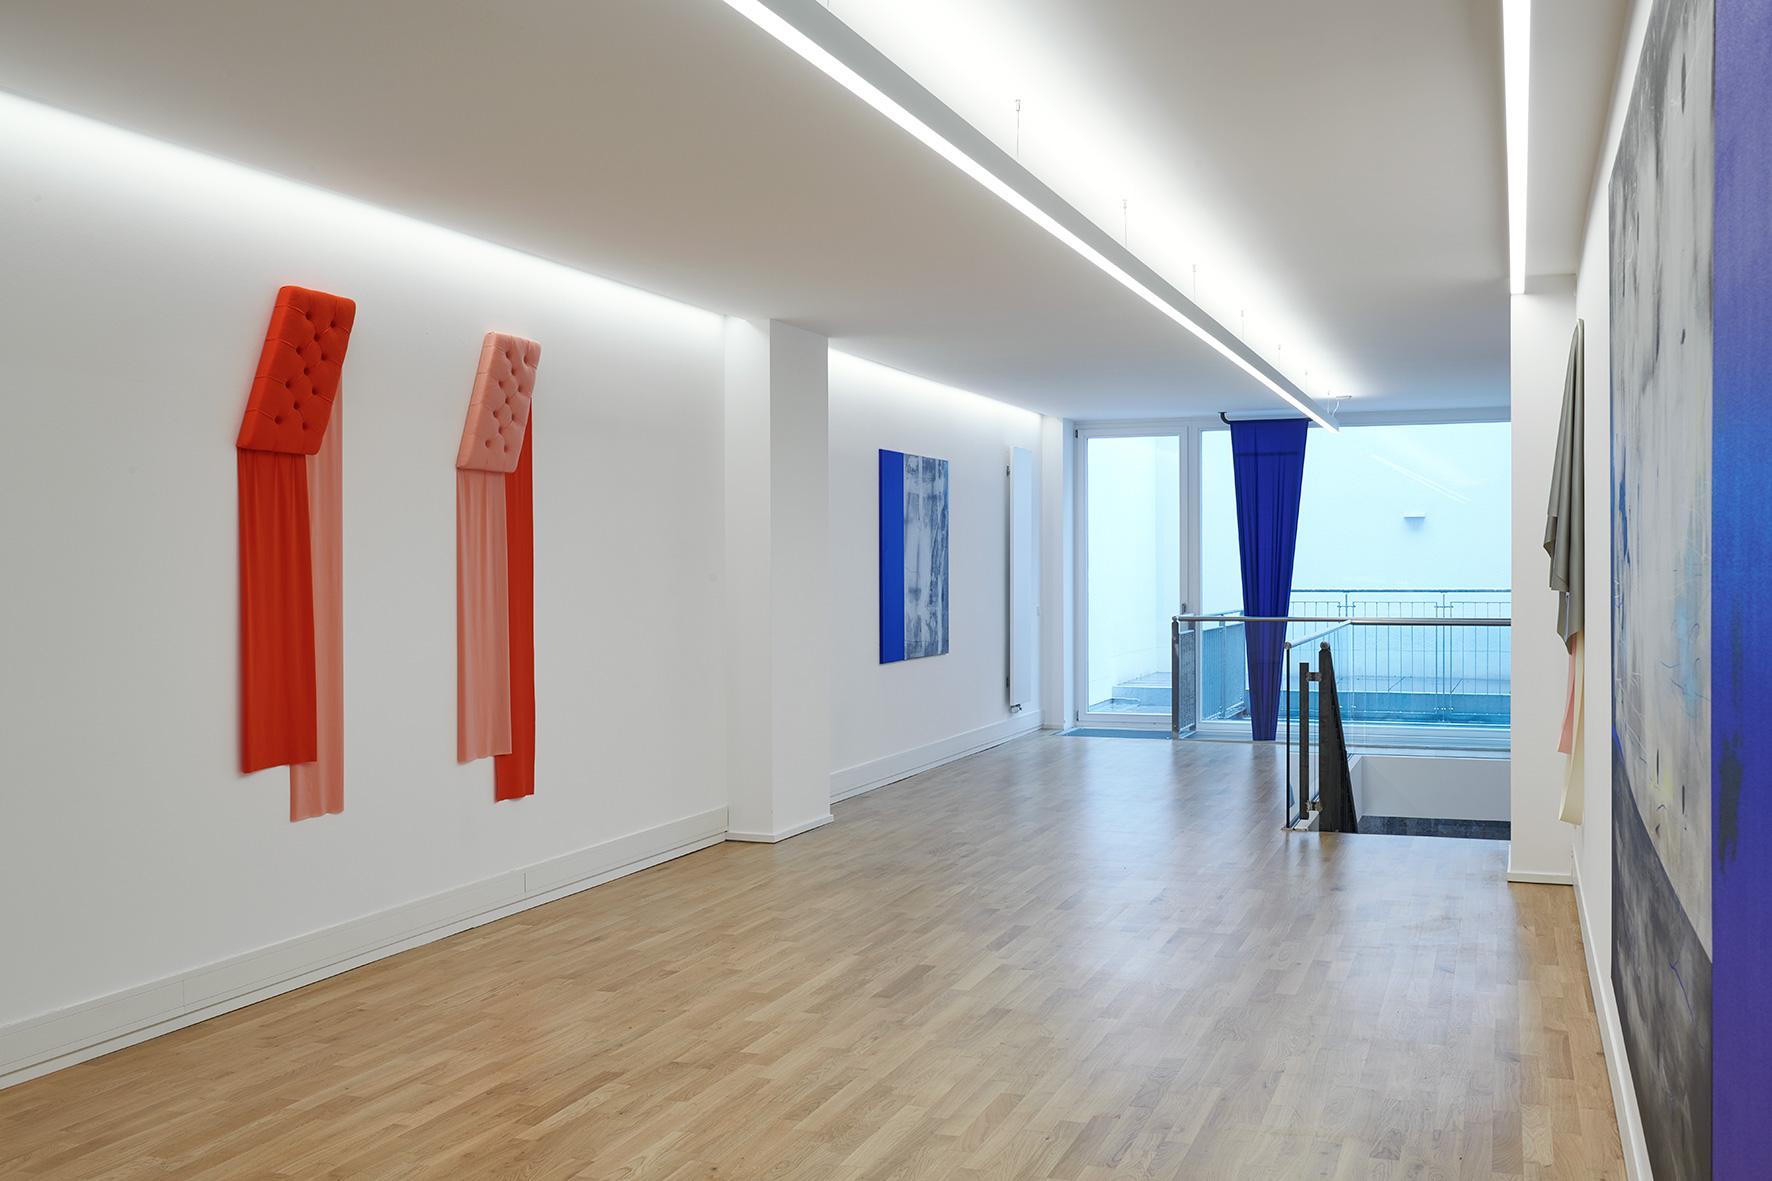 2019.05.08_Galerie-Alber_08.web.jpg